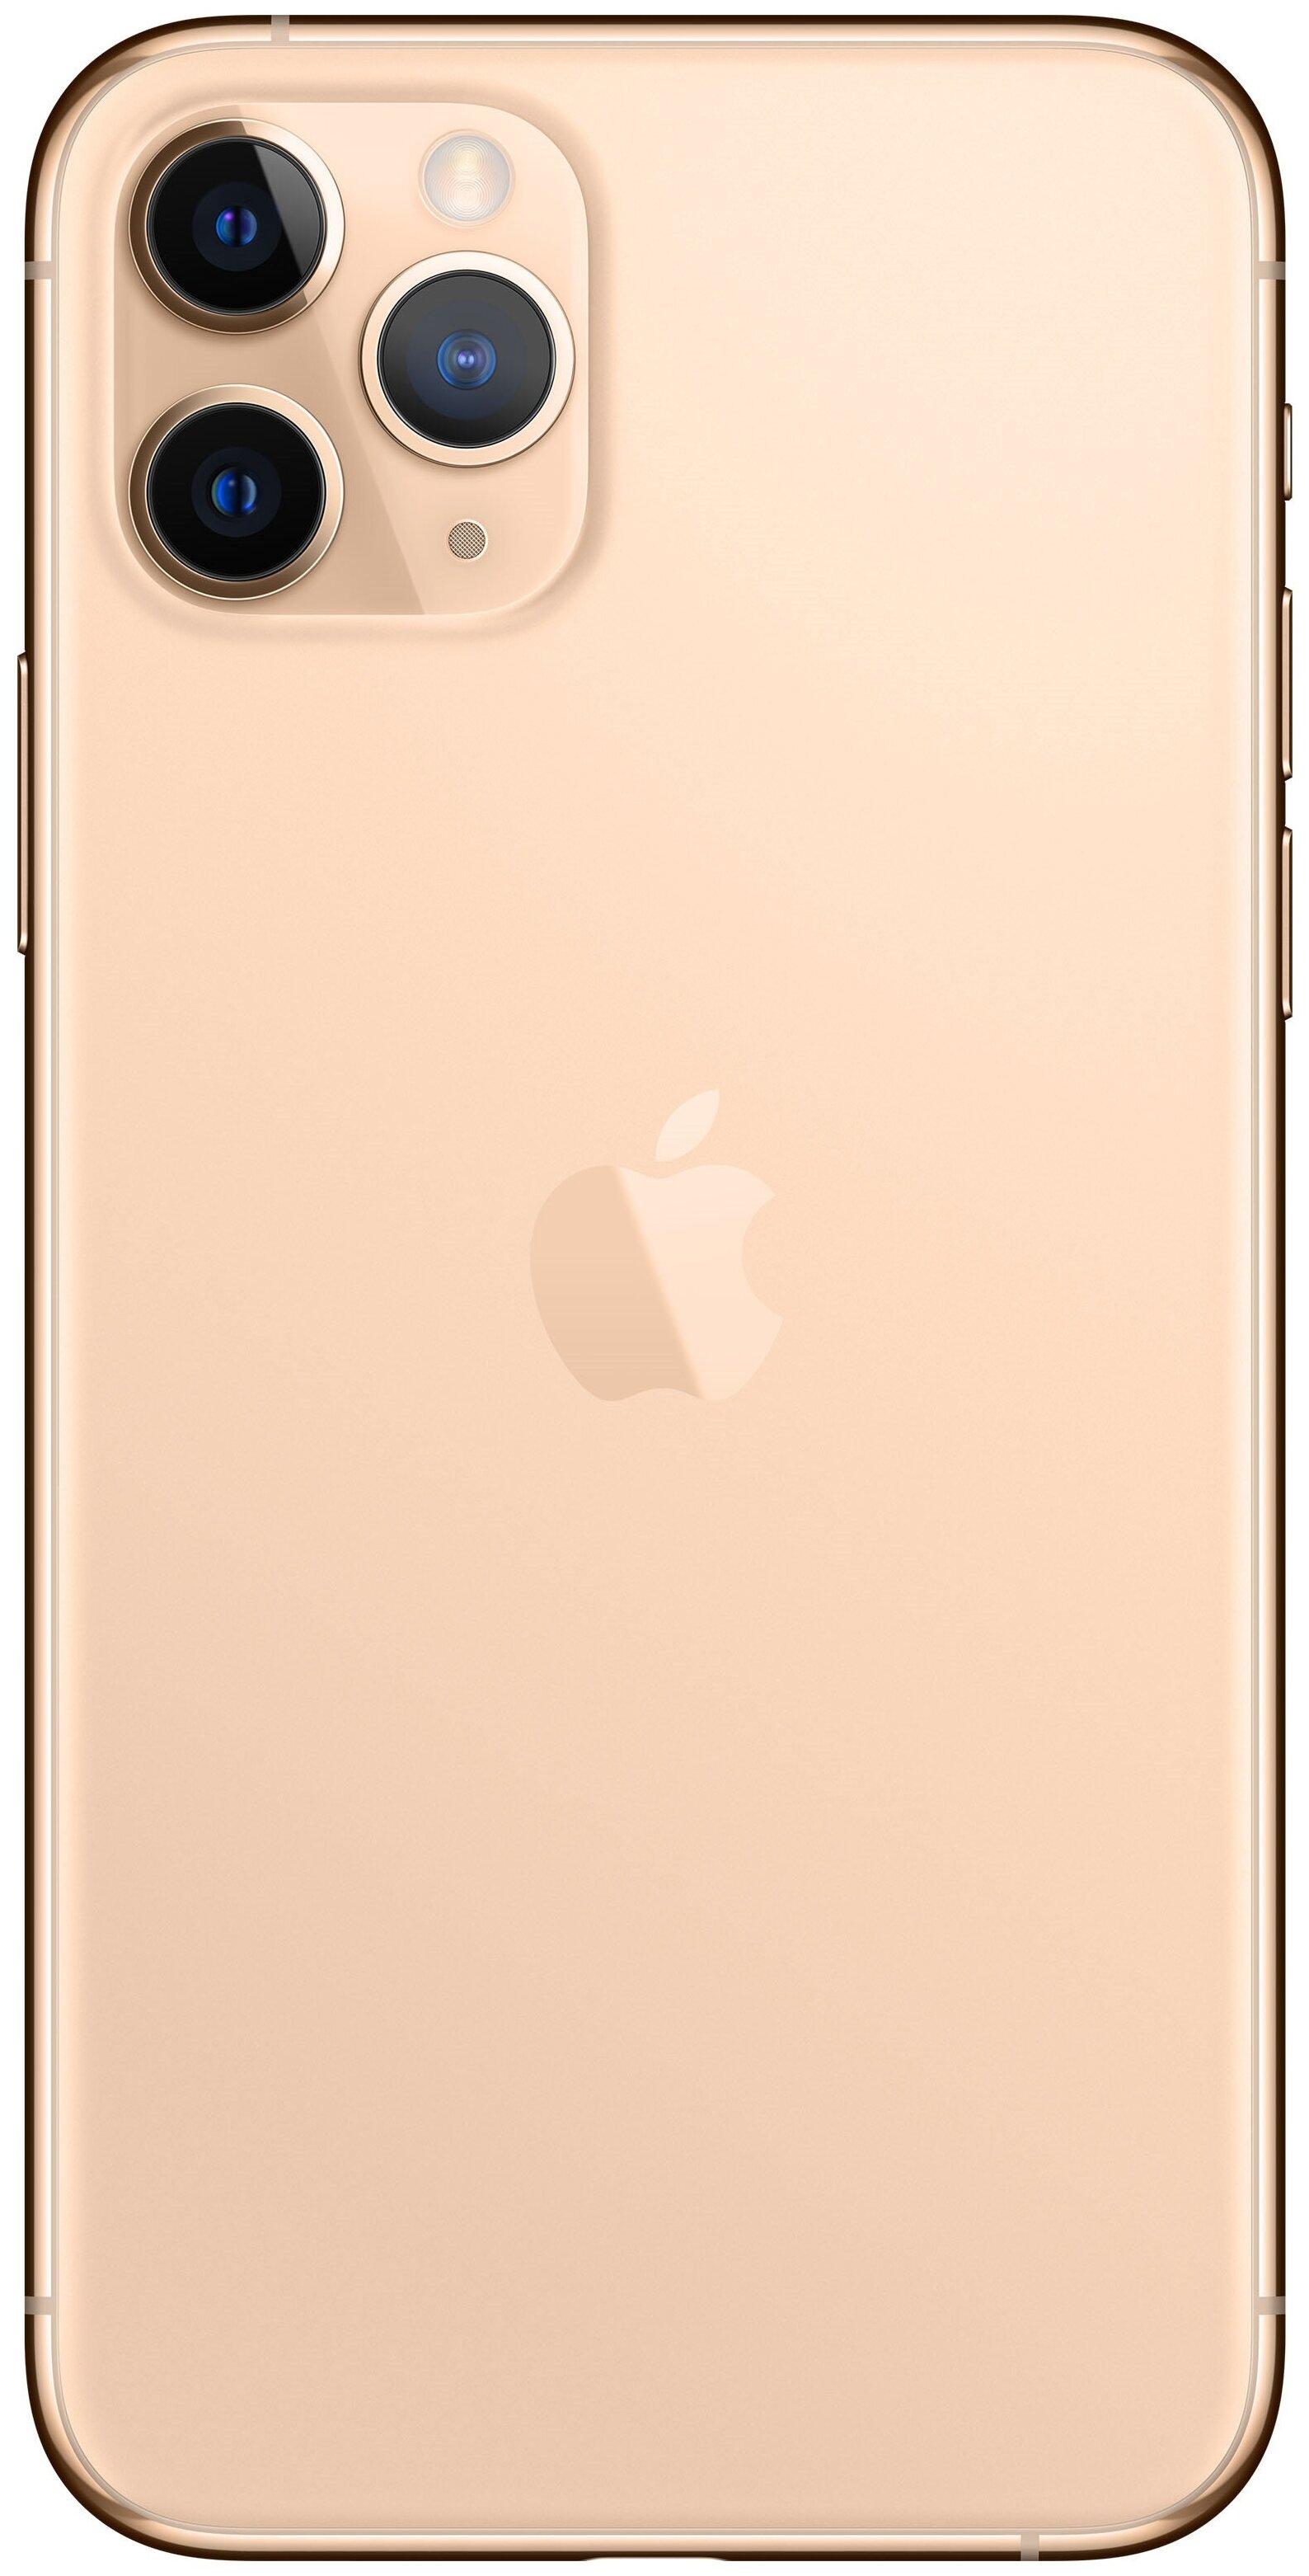 Apple iPhone 11 Pro 512GB - оперативная память: 4ГБ